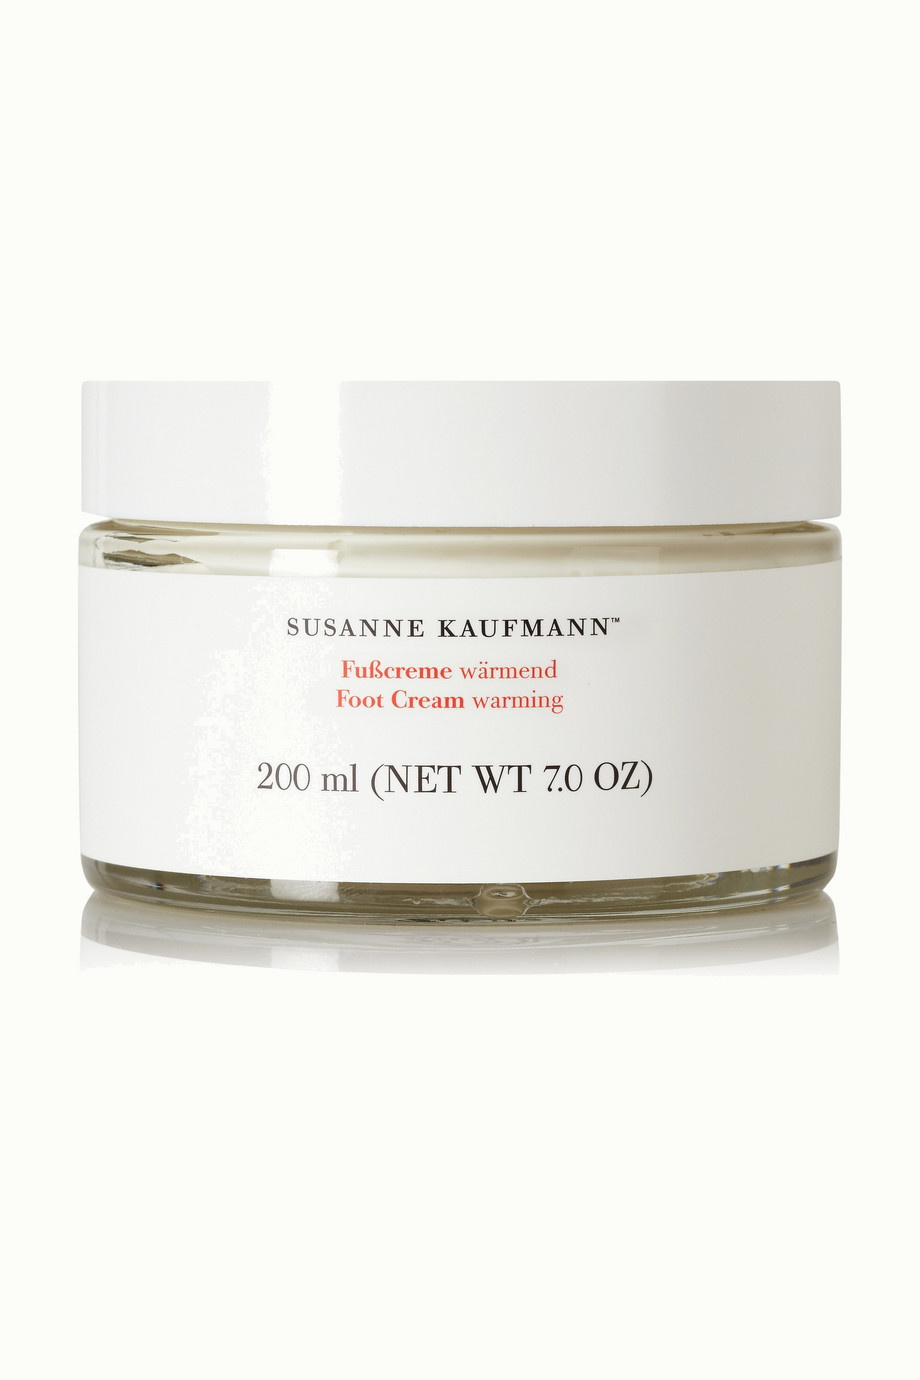 Susanne Kaufmann Warming Foot Cream, 200ml